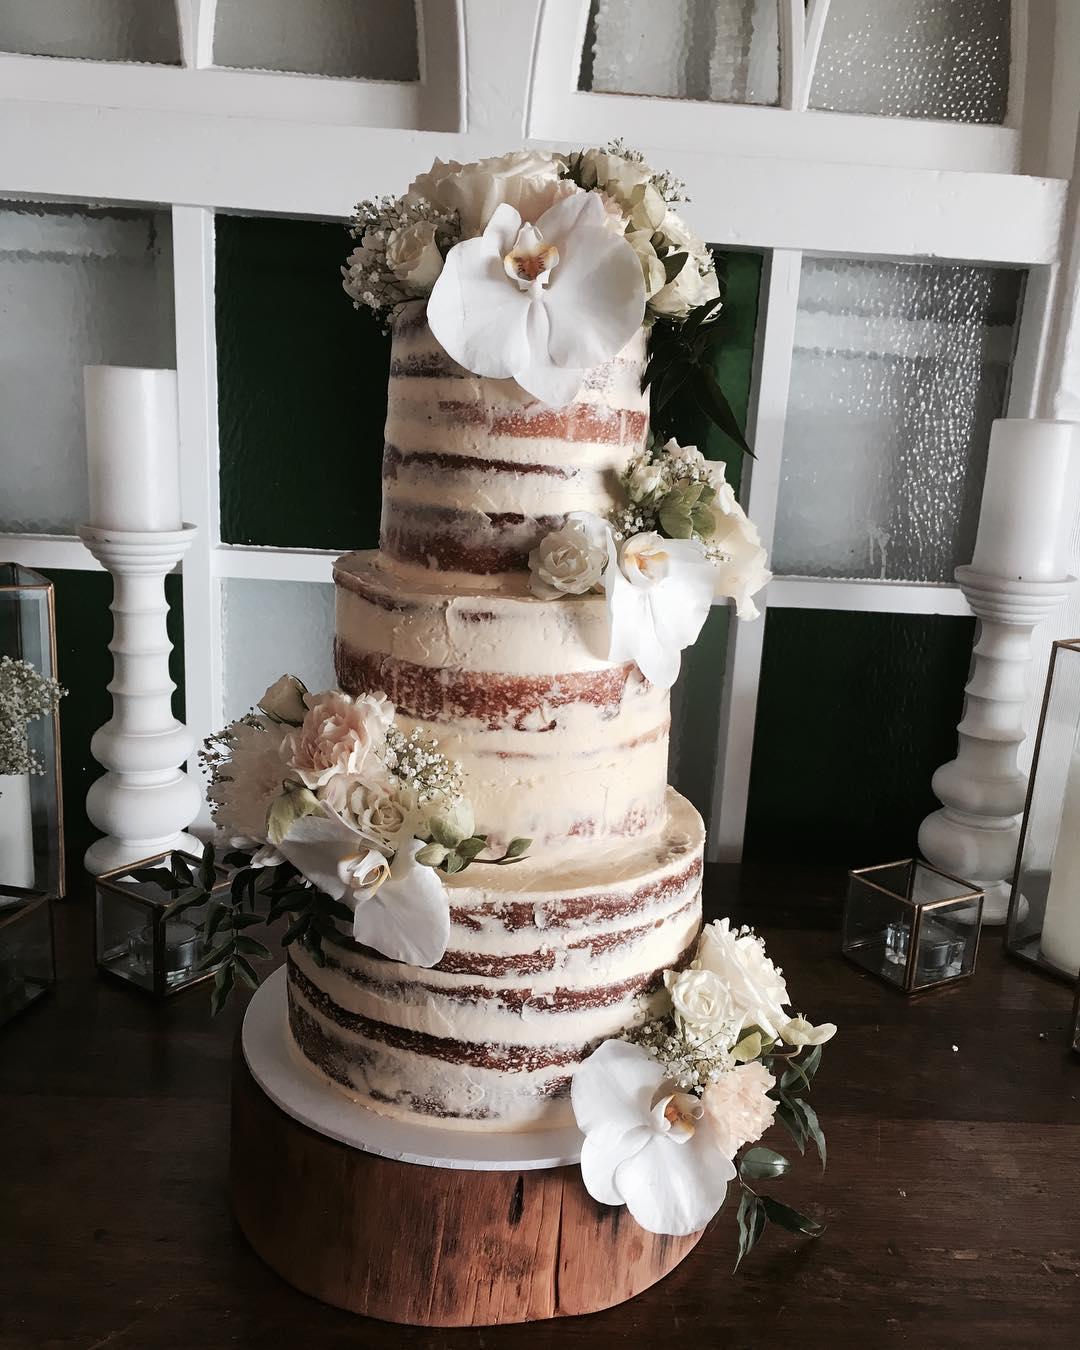 2 Well Travelled Bride Let Them Eat Cake Wedding Cake Byron Bay.jpg